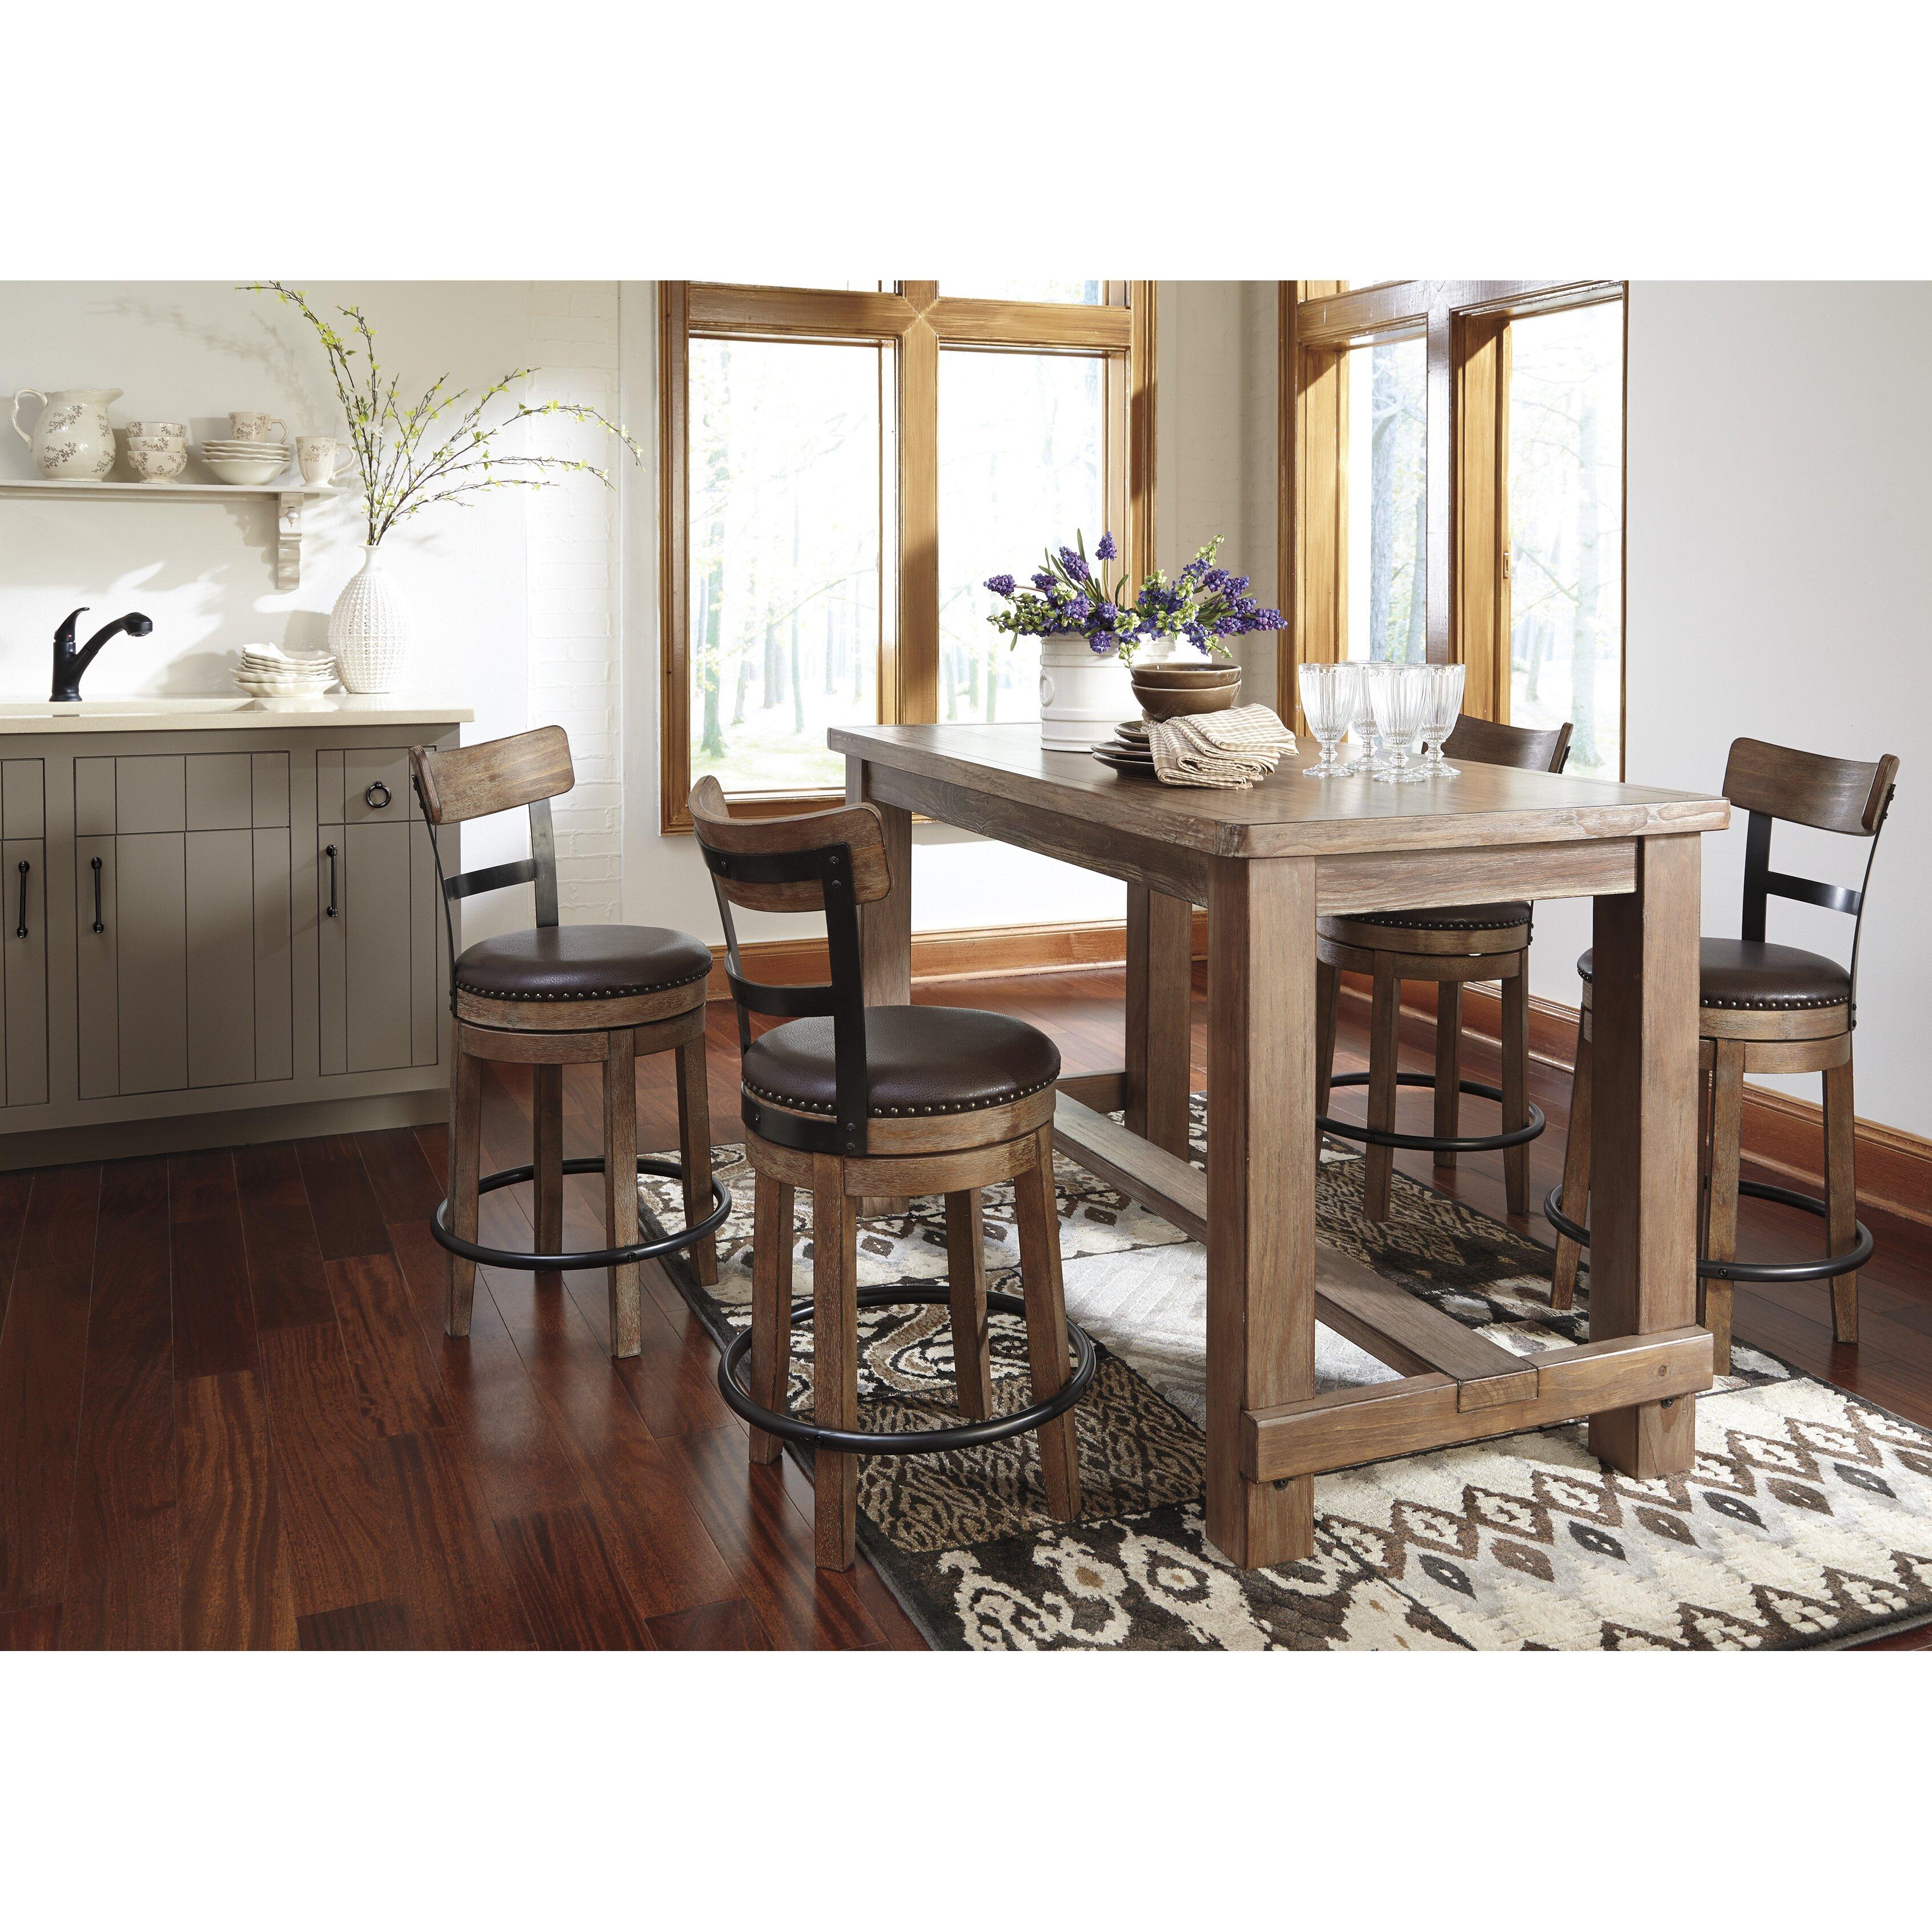 "Ashley Furniture Stores Austin Tx: Trent Austin Design Dalmahoy 24.25"" Swivel Bar Stool With"